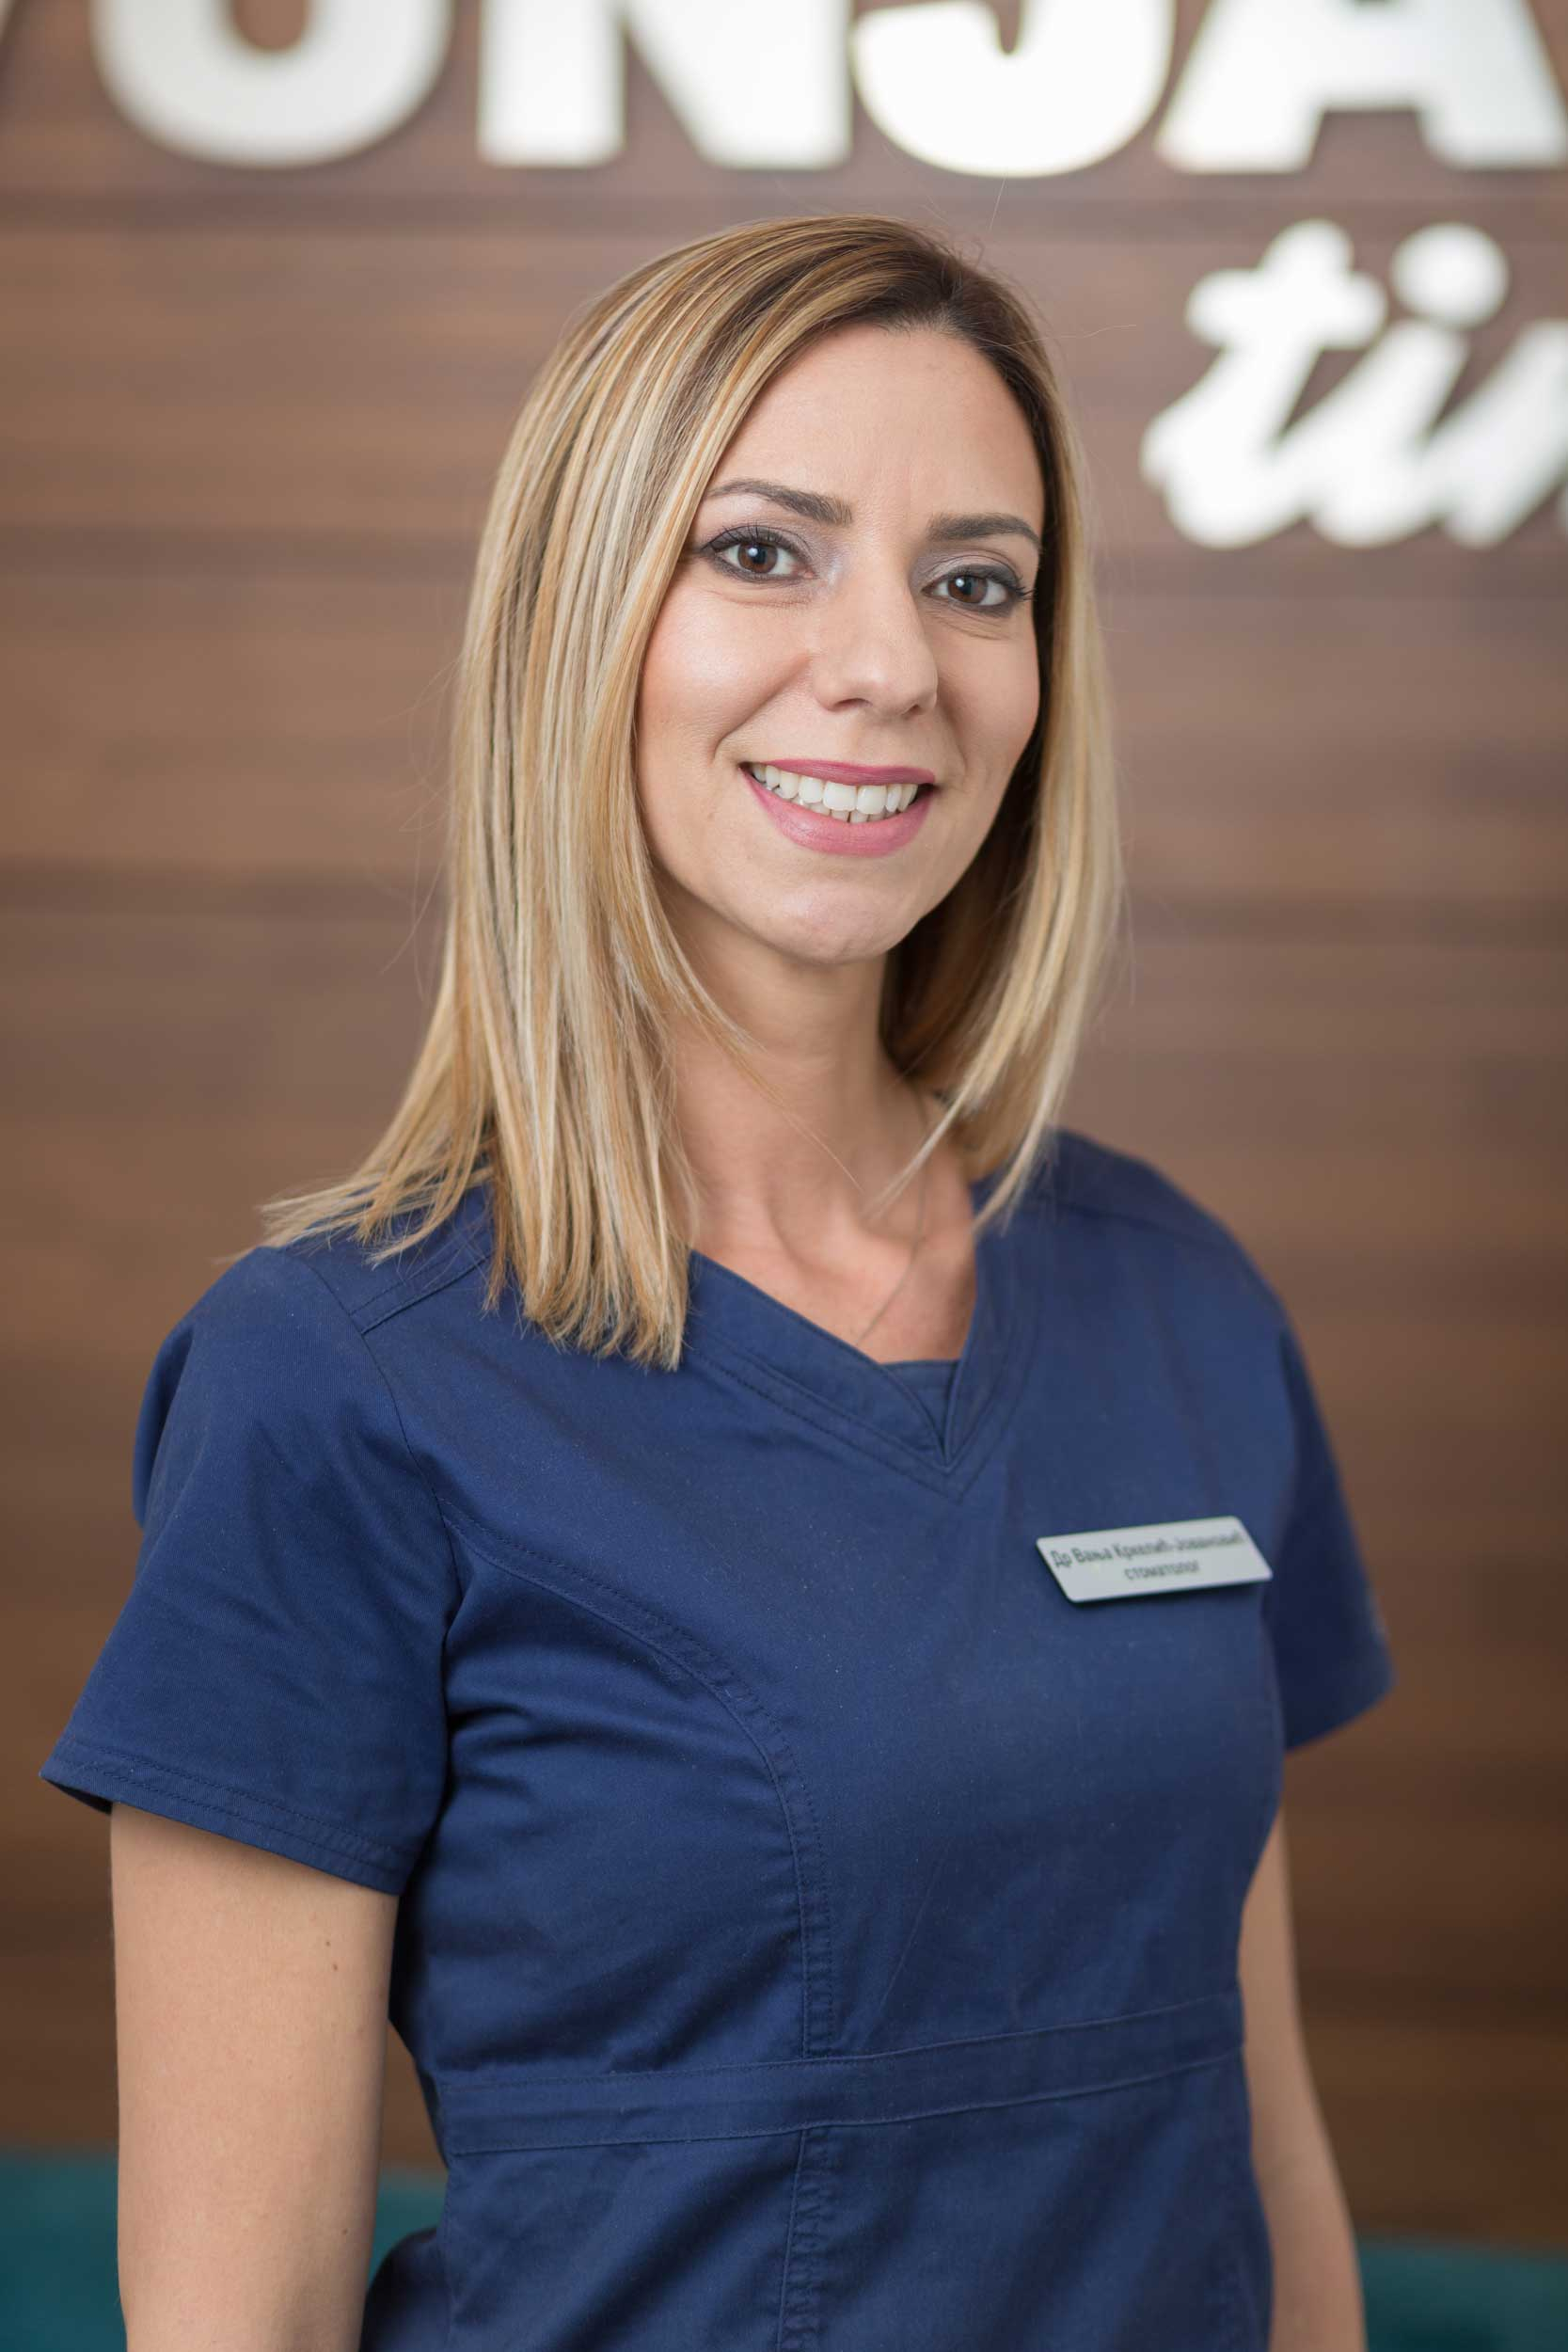 stomatoloska-ordinacija-vunjak-dental-clinic-doktorka-vanja-krkelic-jovanovic